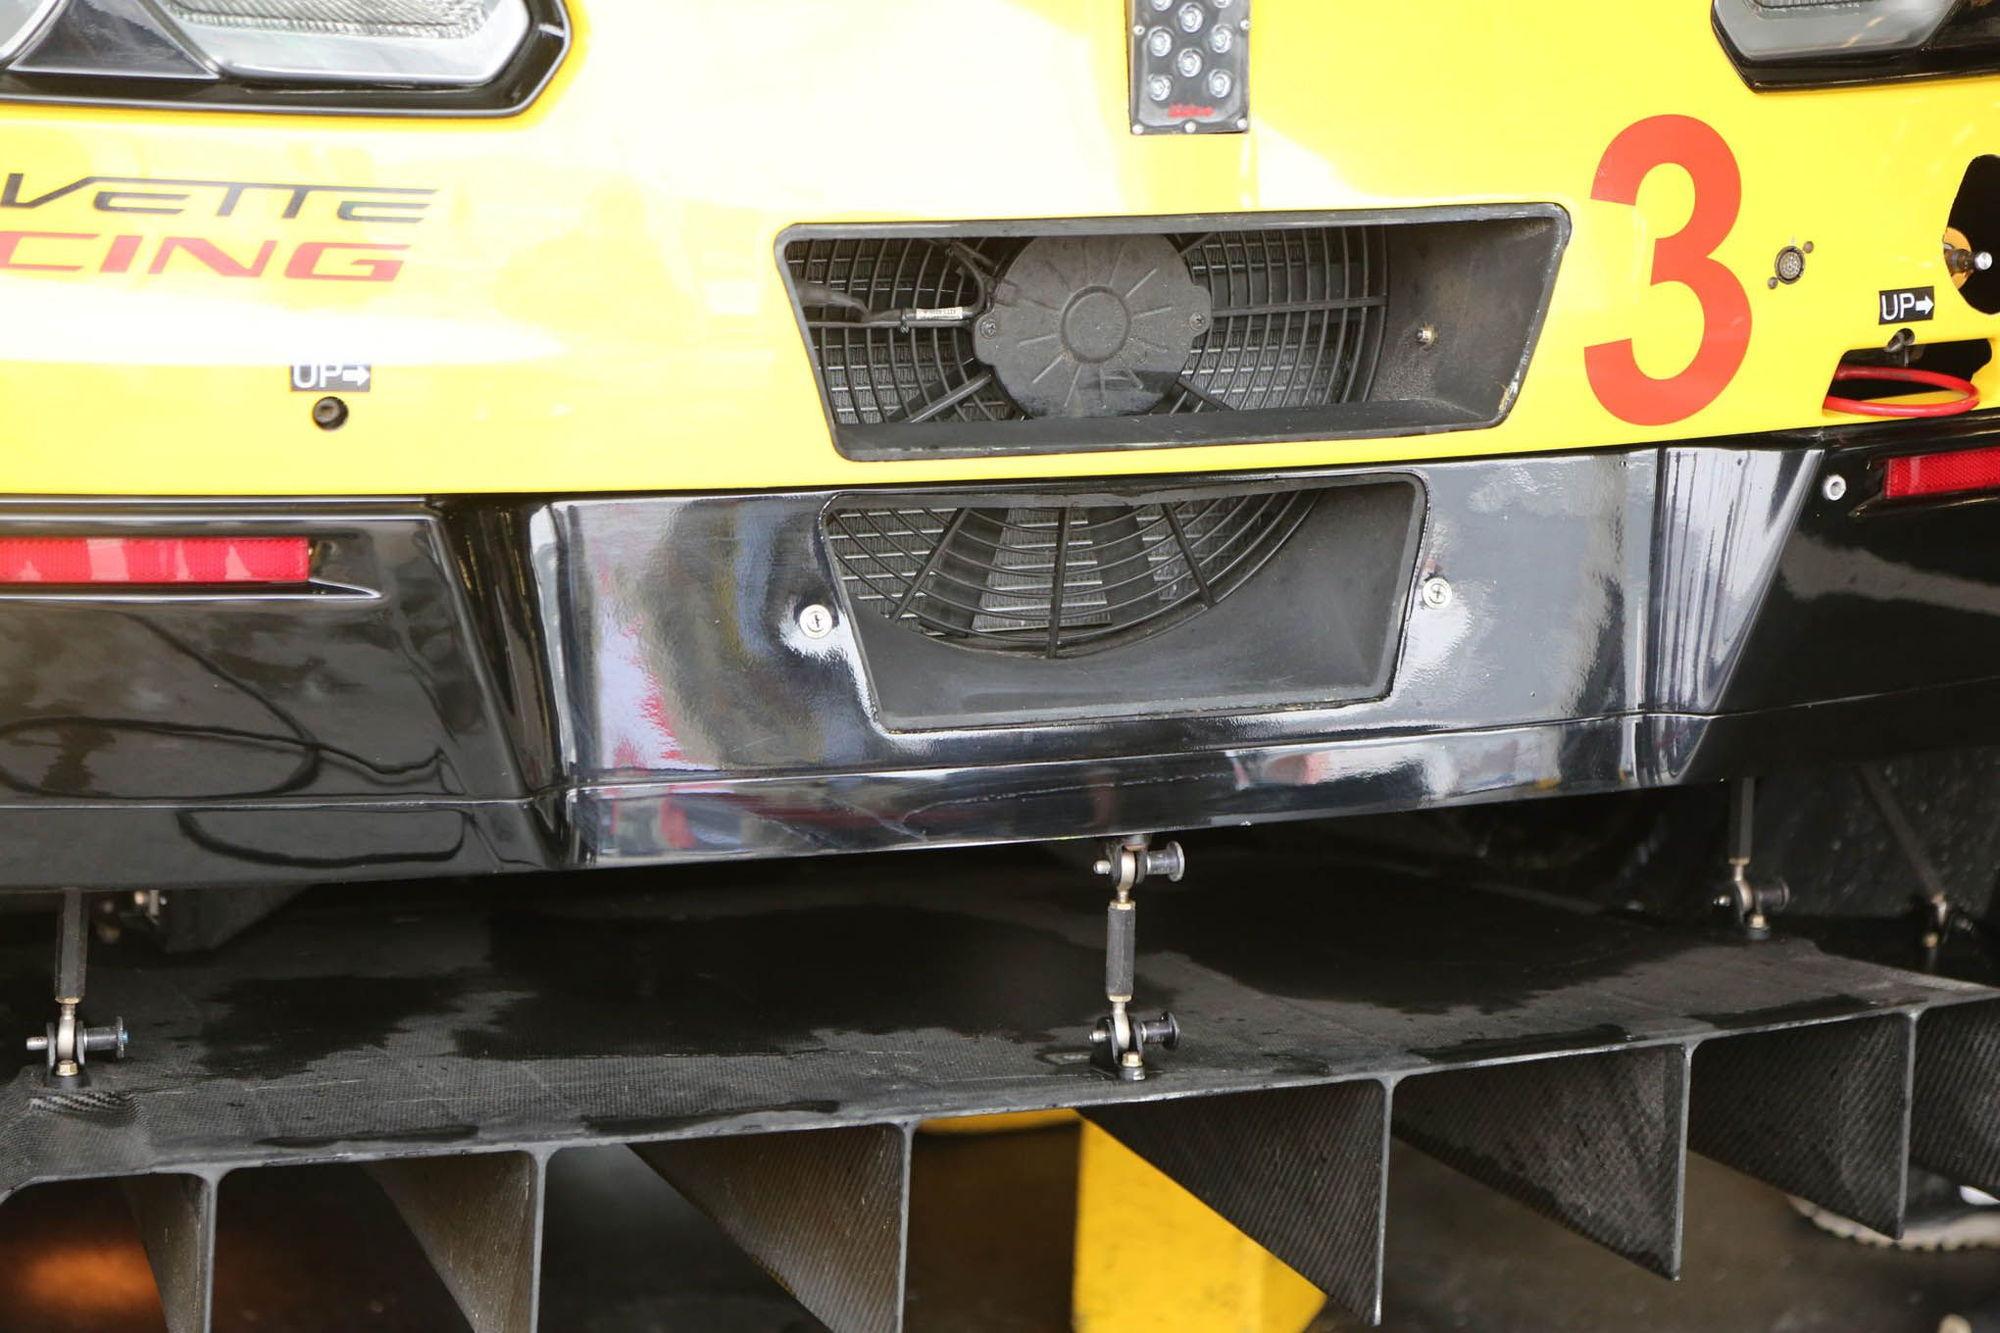 C6z06 Rear Trans Diff Cooling Corvetteforum Chevrolet